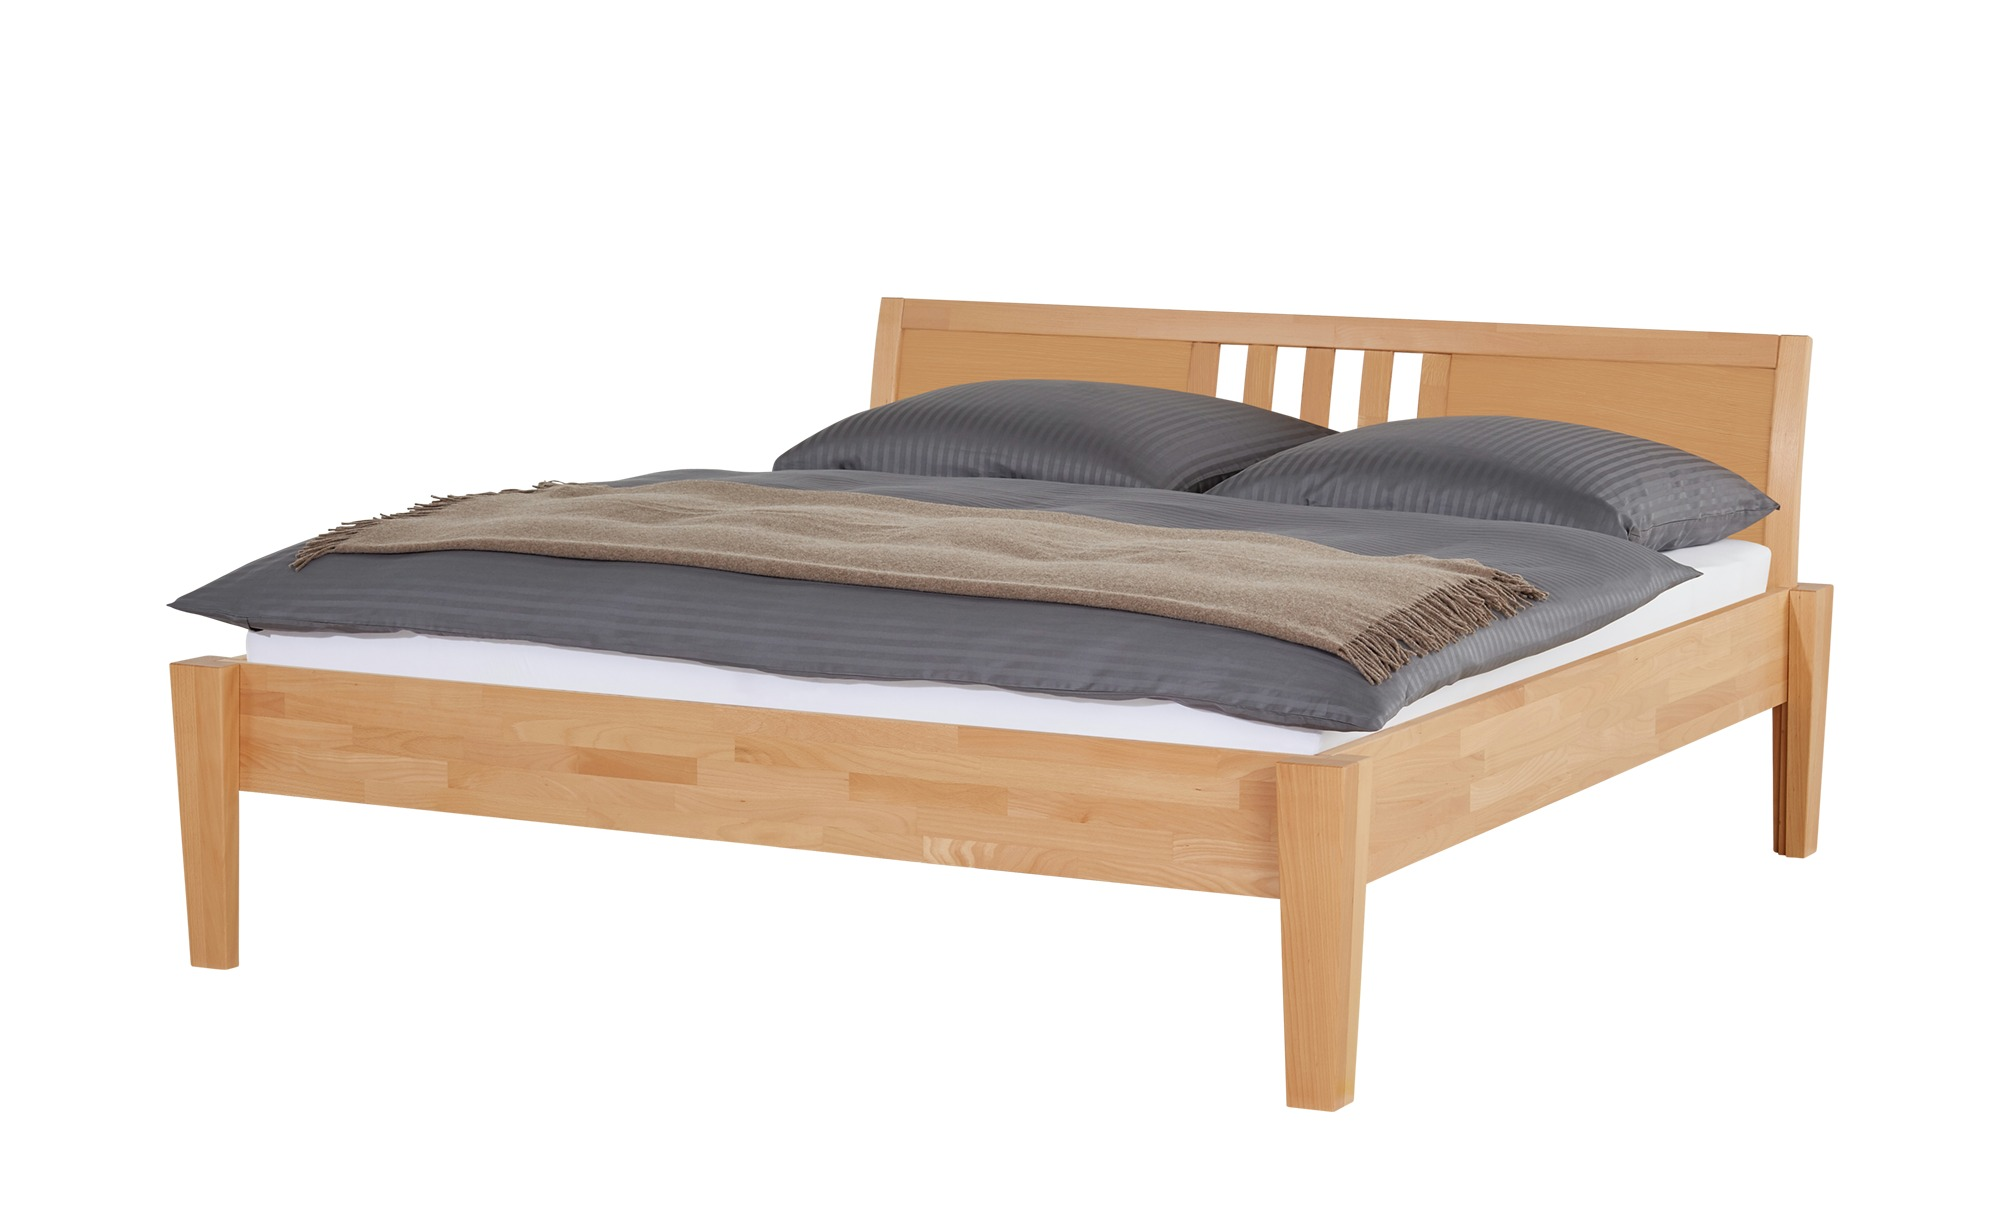 Massivholz-Bettgestell | 180 cm, Buche Natur - Möbel Kraft